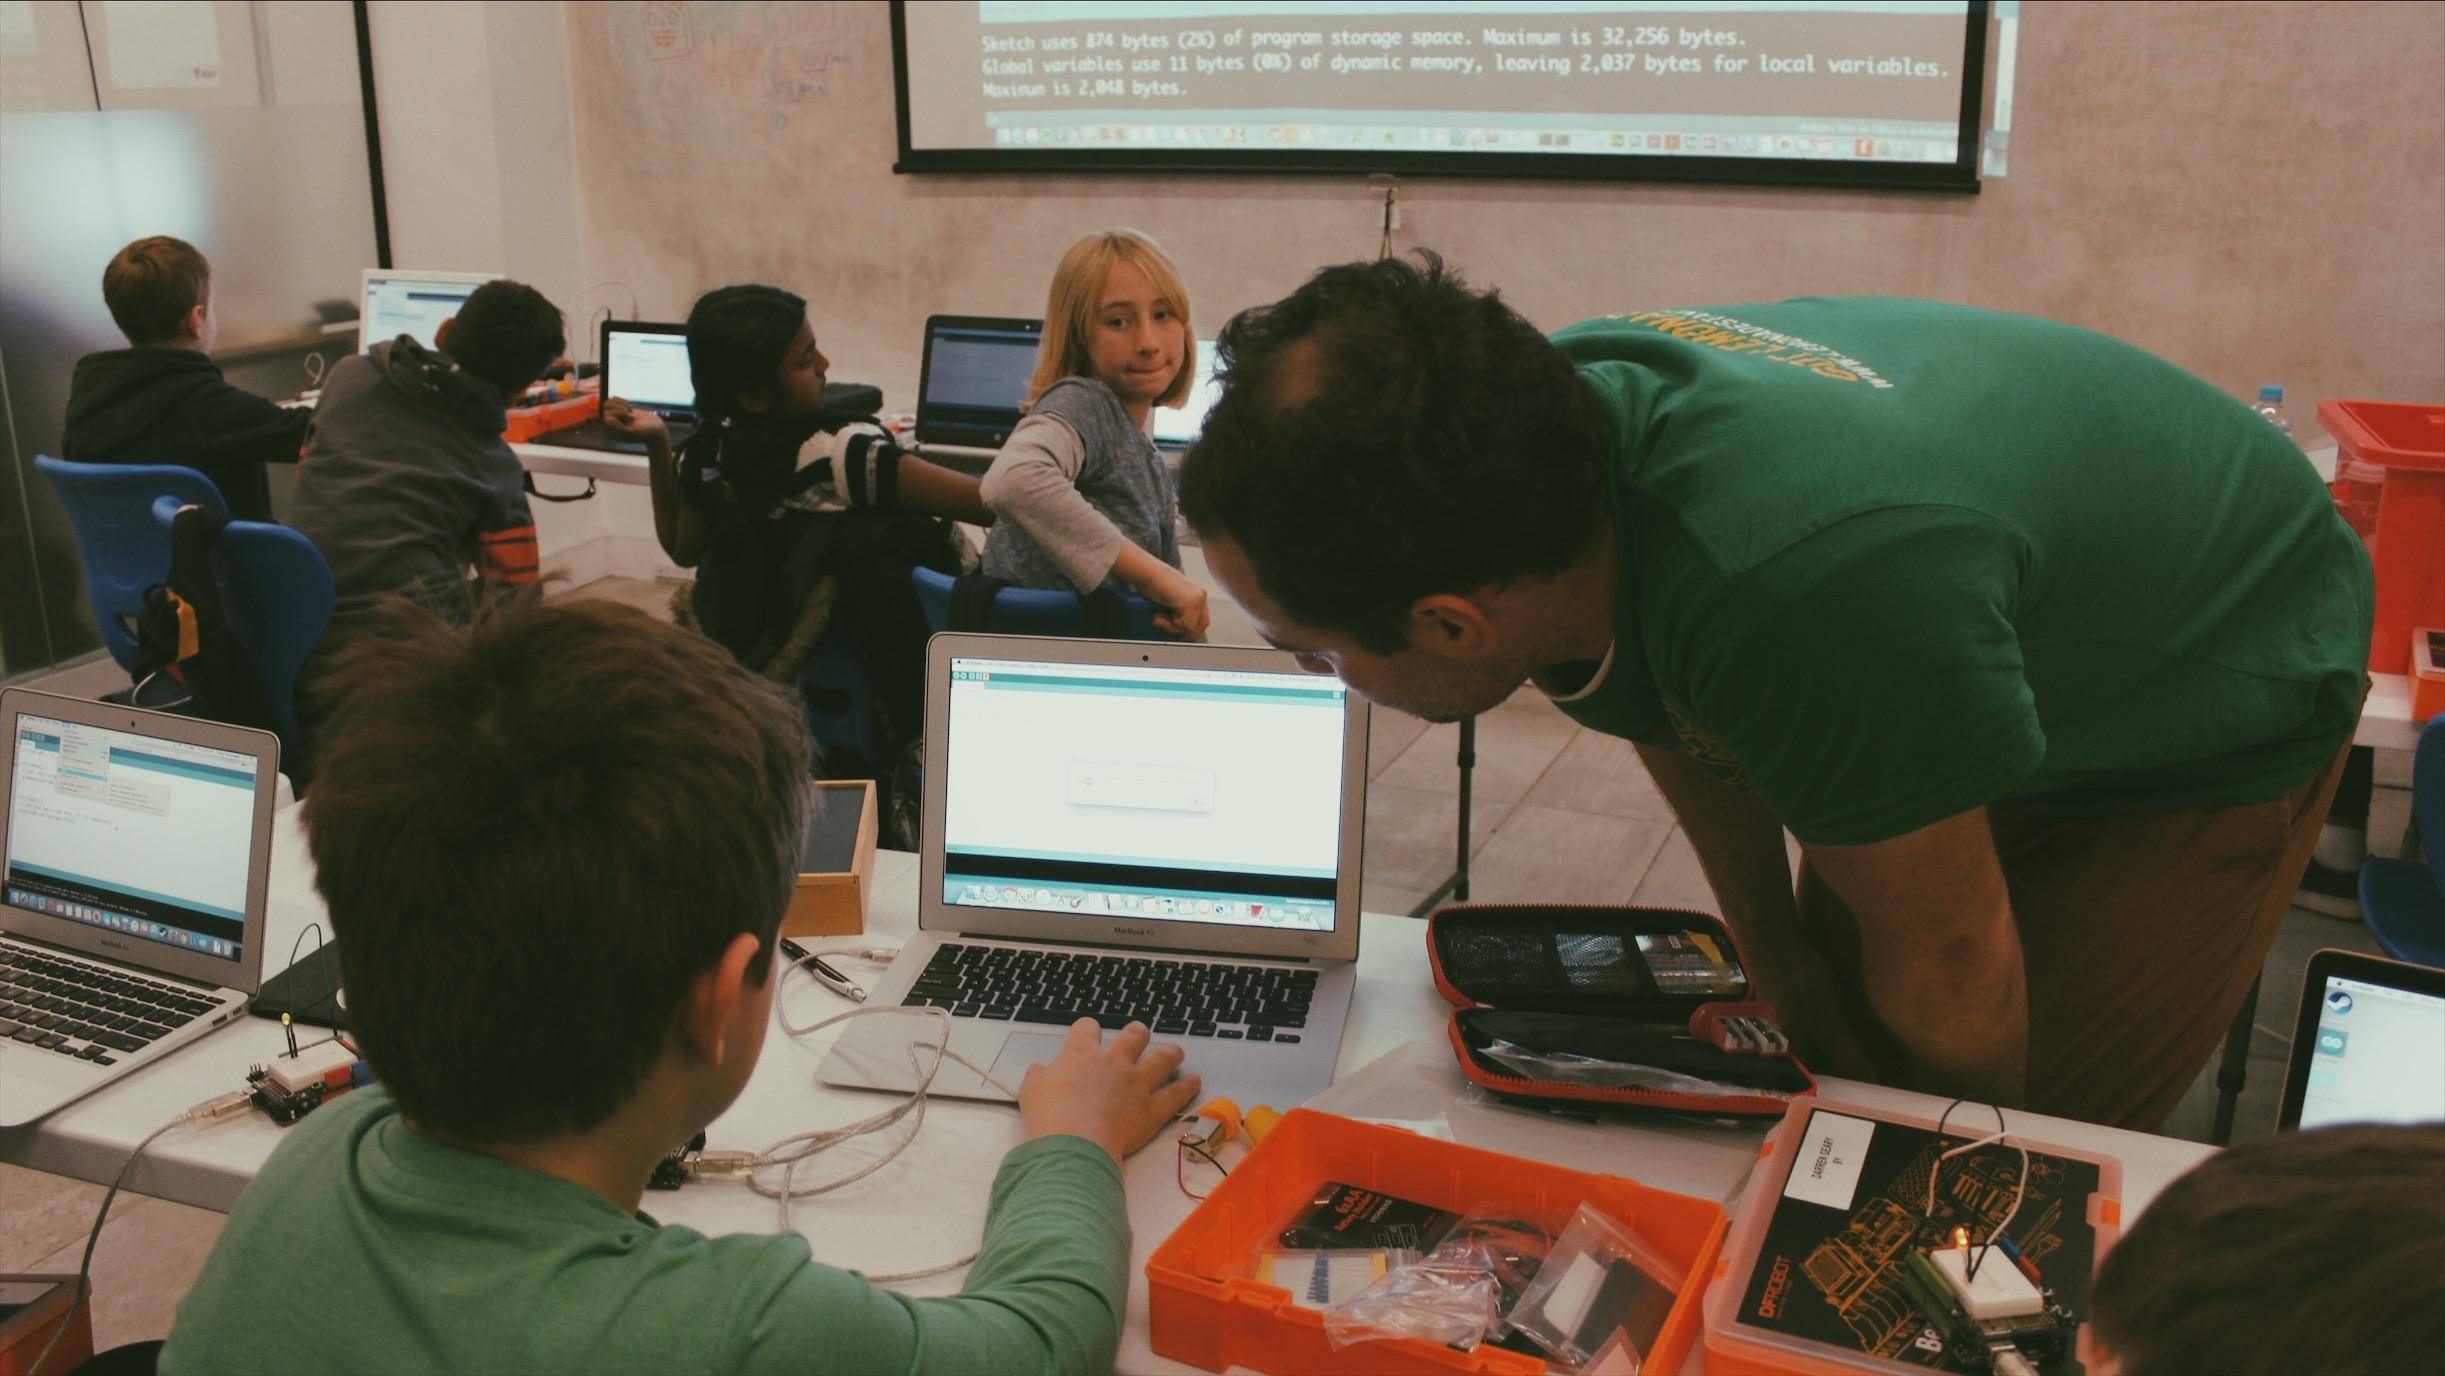 Lemonade Stand Kids Coding: a facilitator teaches a boy how to code